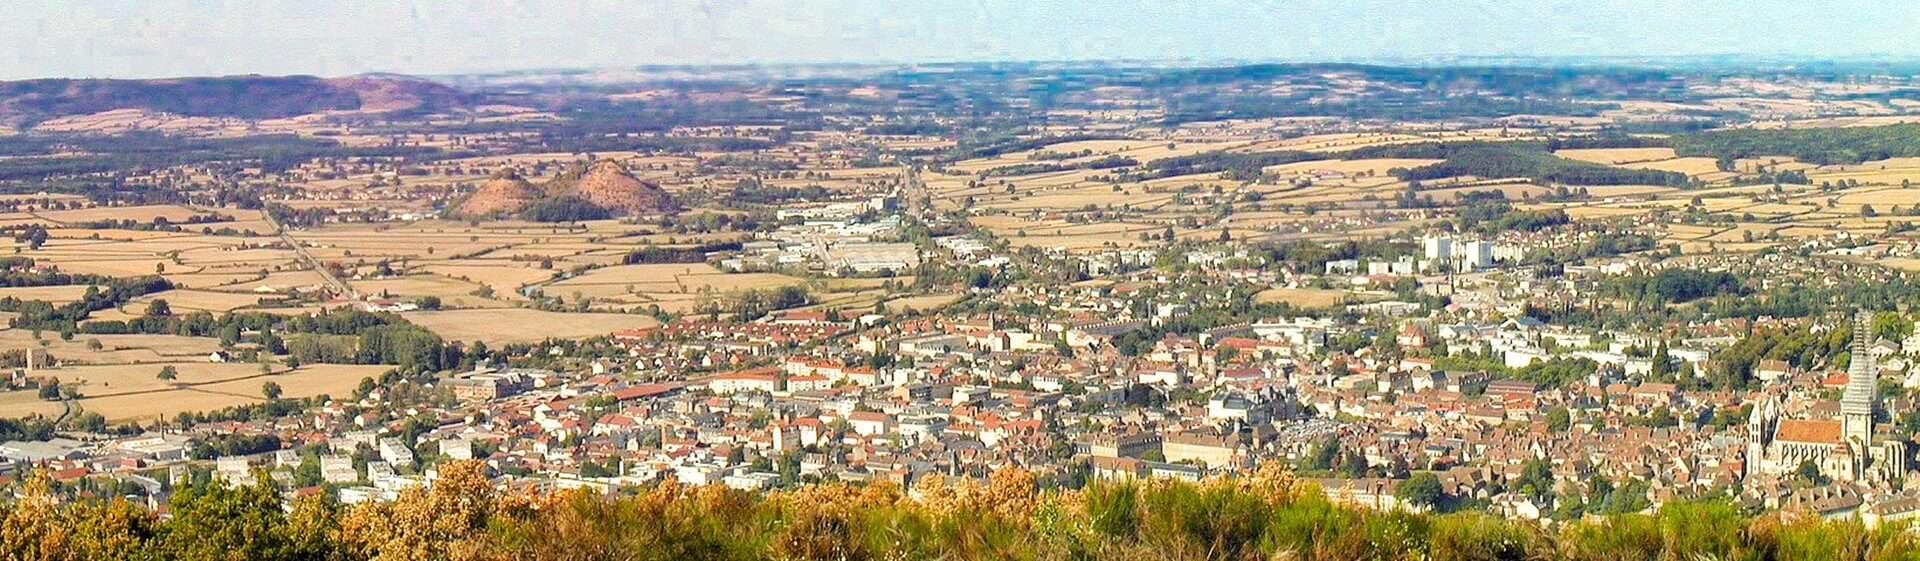 Archaeology Travel   Autun in Autumn - A Ville d'art et d'histoire in Burgundy   1